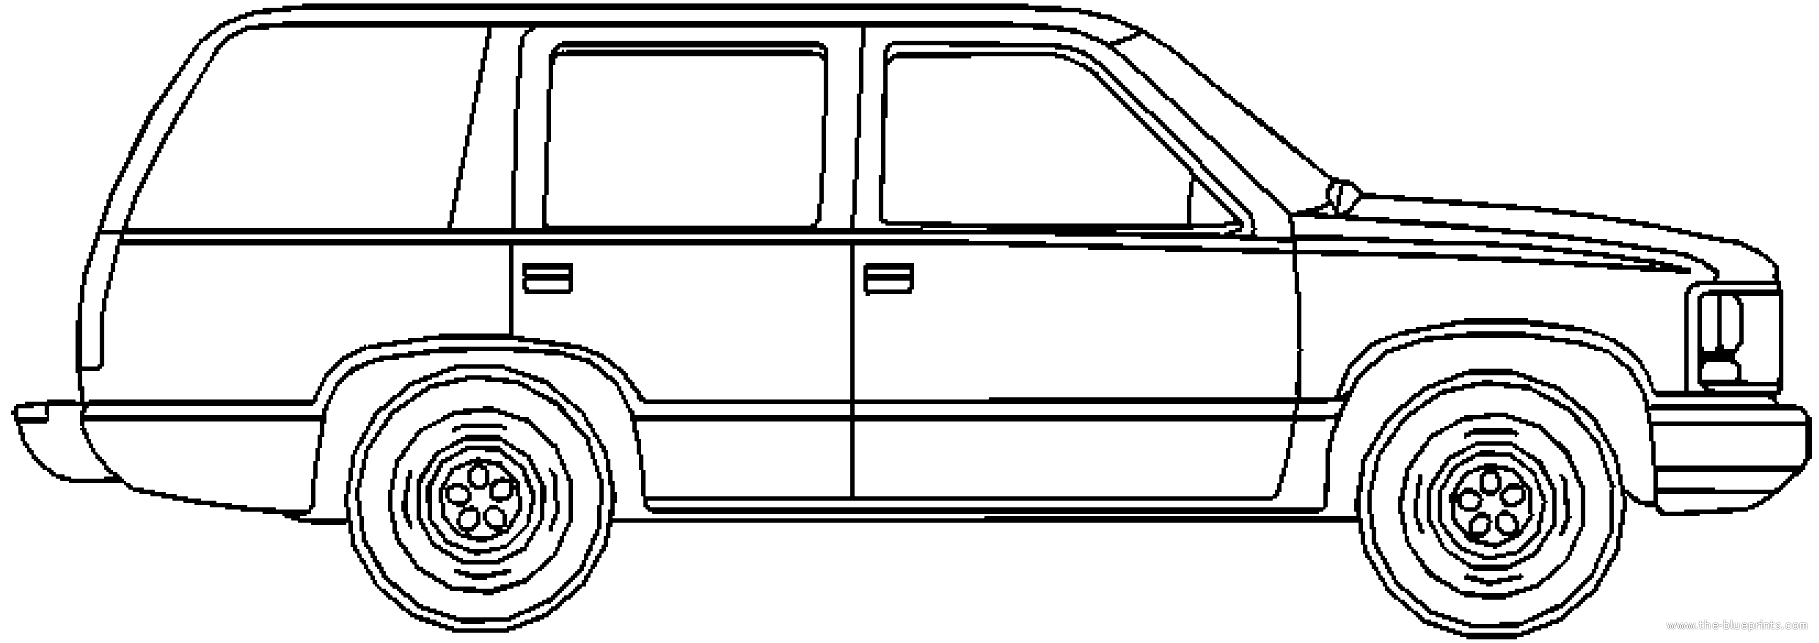 blueprints  u0026gt  cars  u0026gt  gmc  u0026gt  gmc envoy  2002